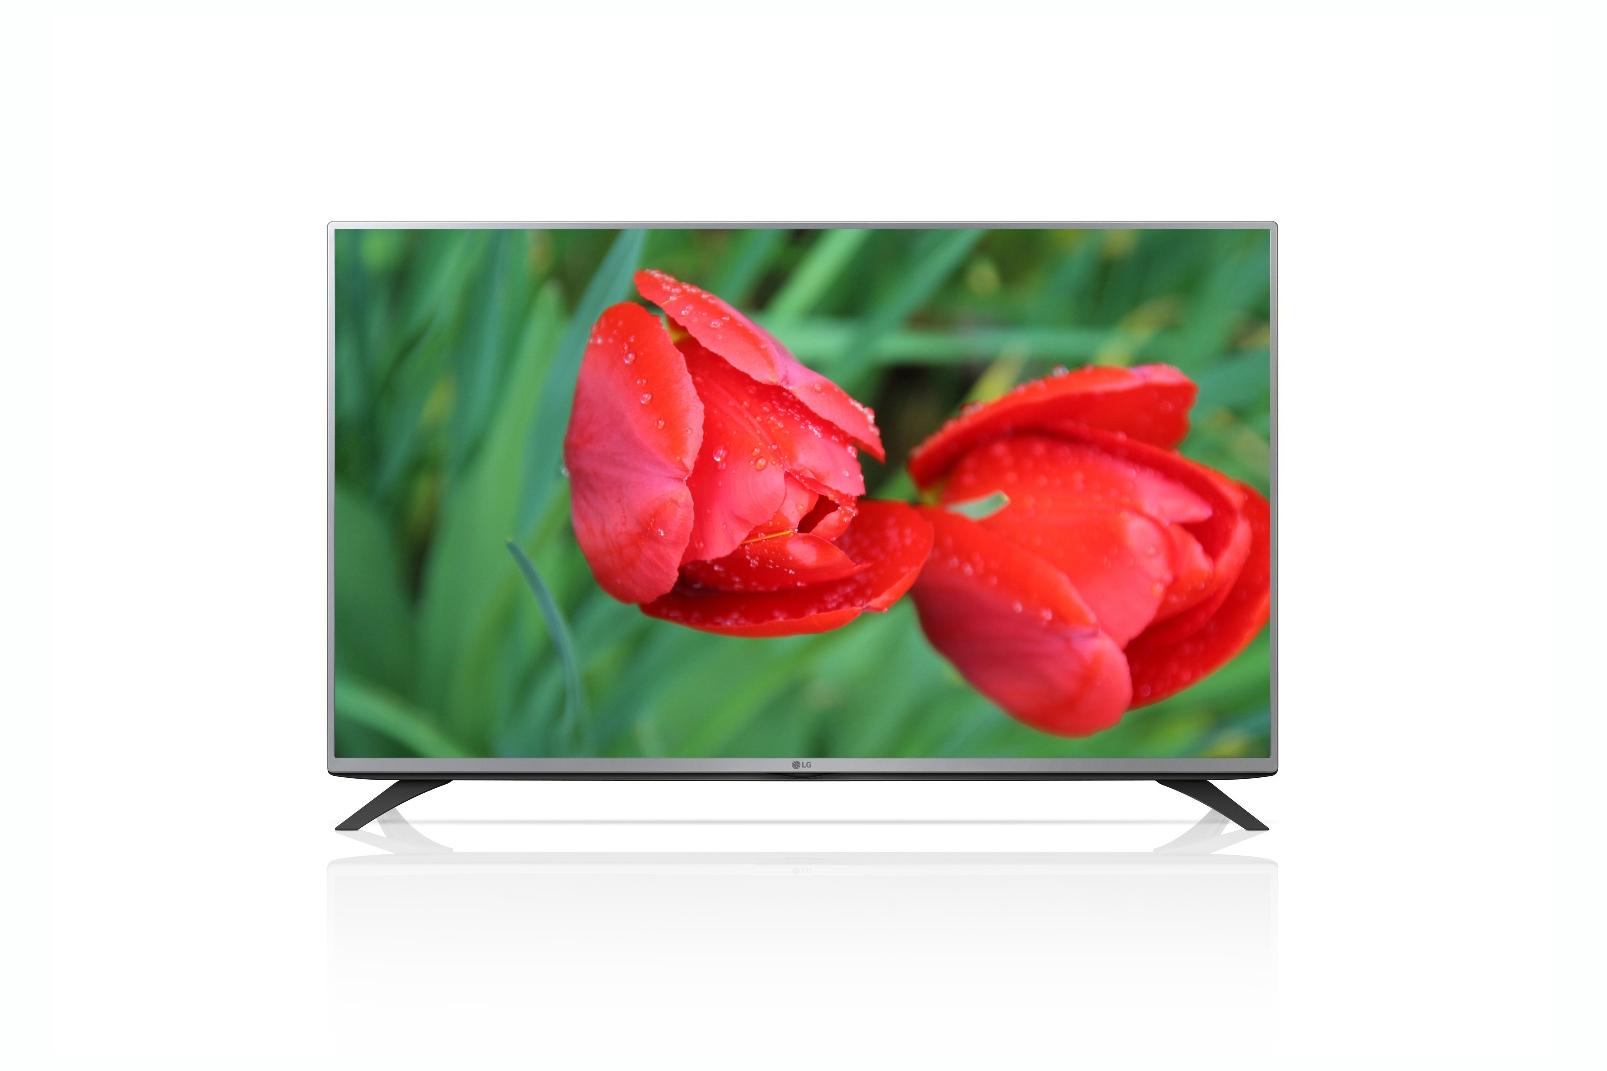 lg 43lf540v 43 farbfernseher lcd led tv 108 cm full hd hdtv usb a tuner ovp ebay. Black Bedroom Furniture Sets. Home Design Ideas